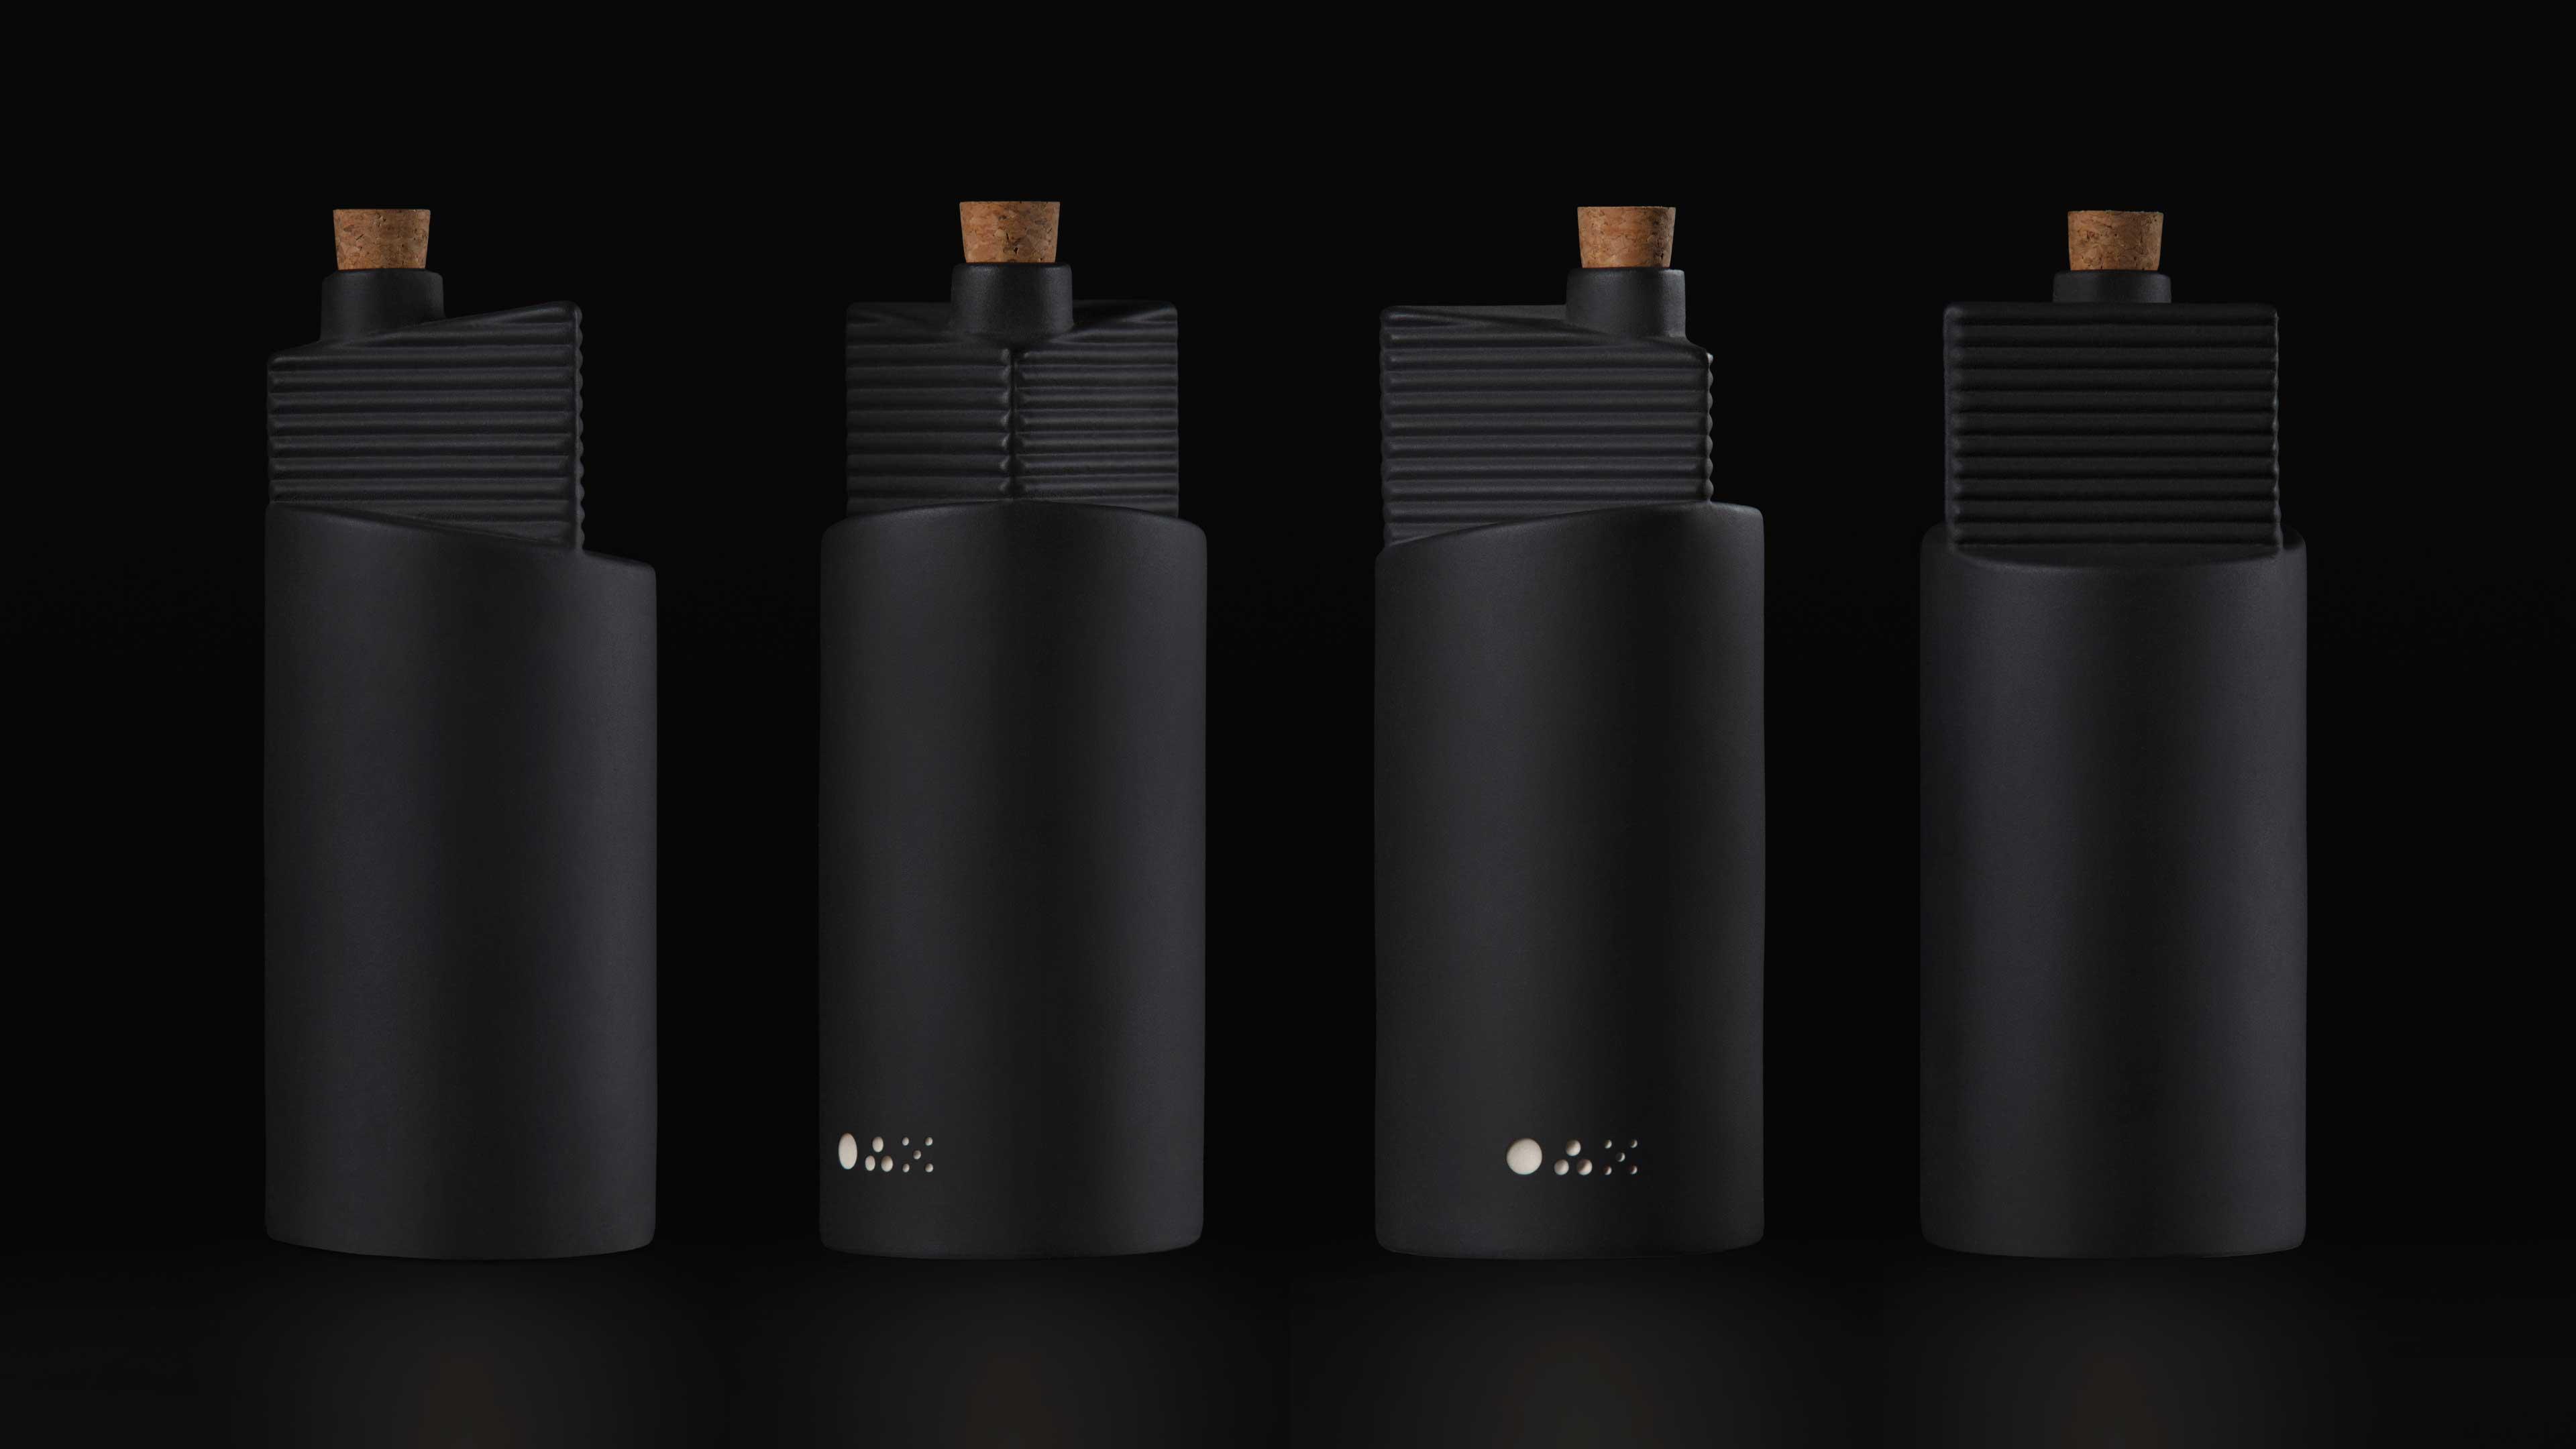 Bardo Industries Creates Custom Ceramic Bottles for Oax Original